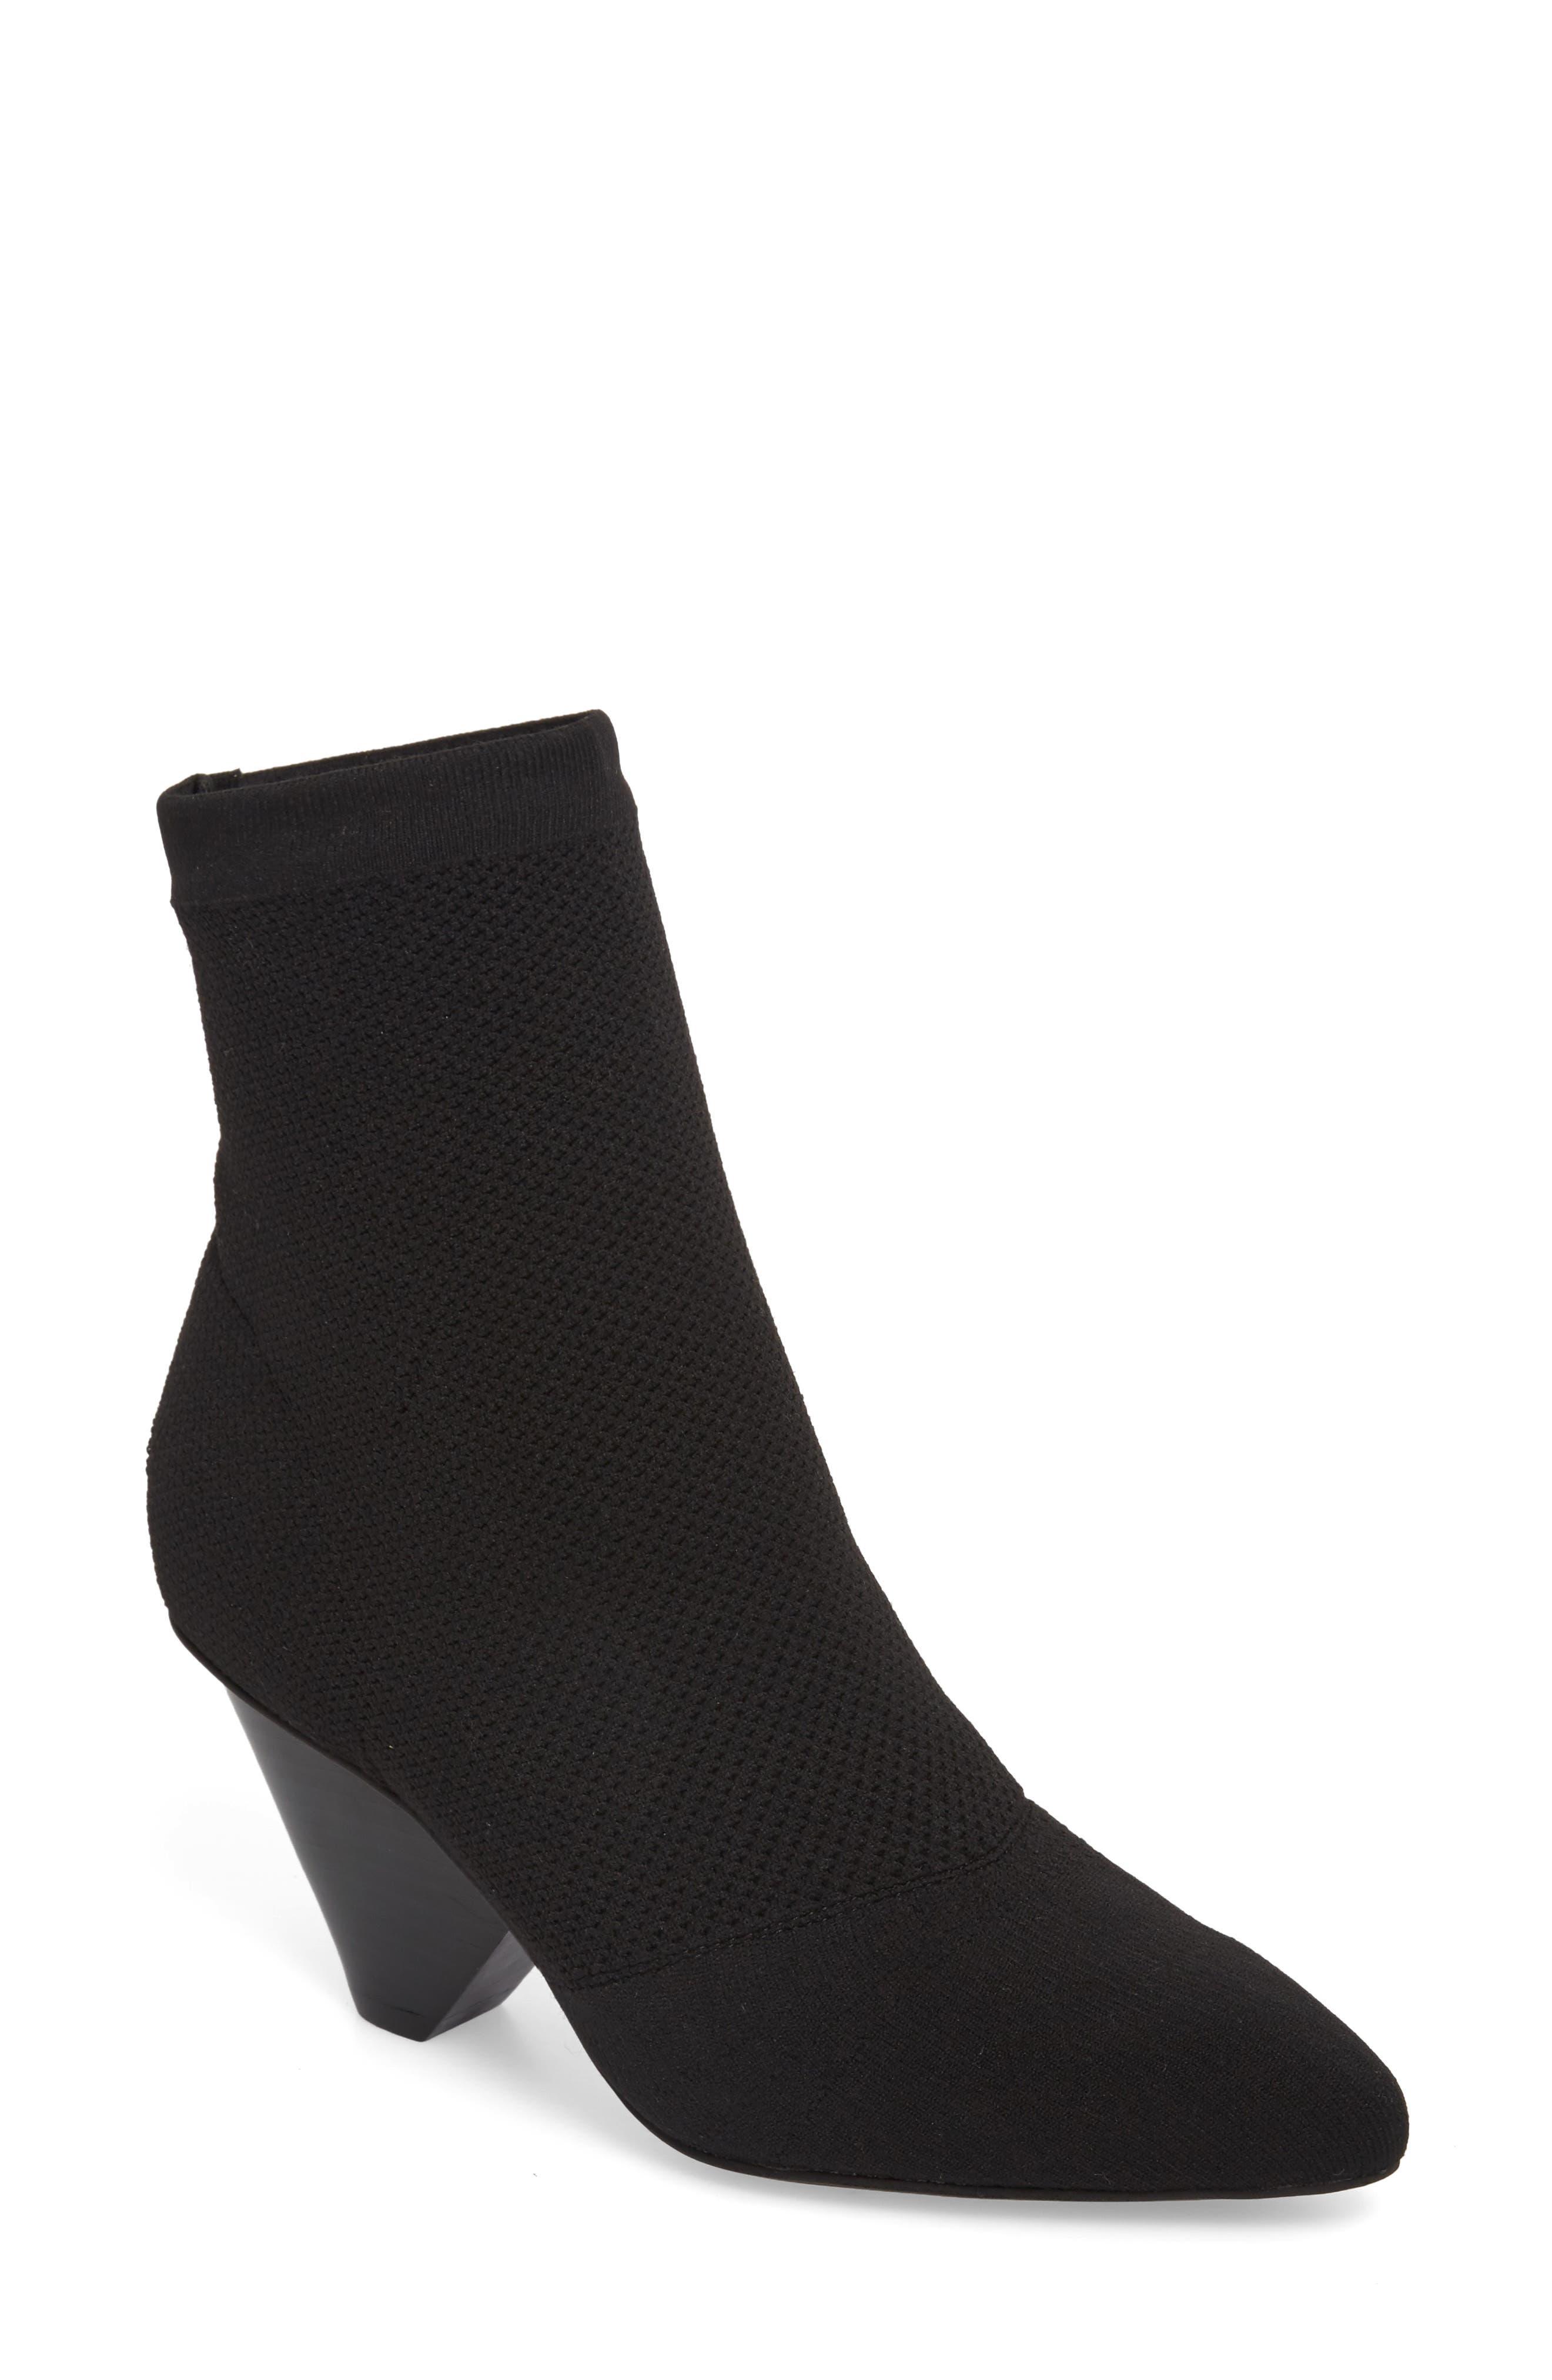 Alternate Image 1 Selected - Jeffrey Campbell Acadia 2 Sock Bootie (Women)